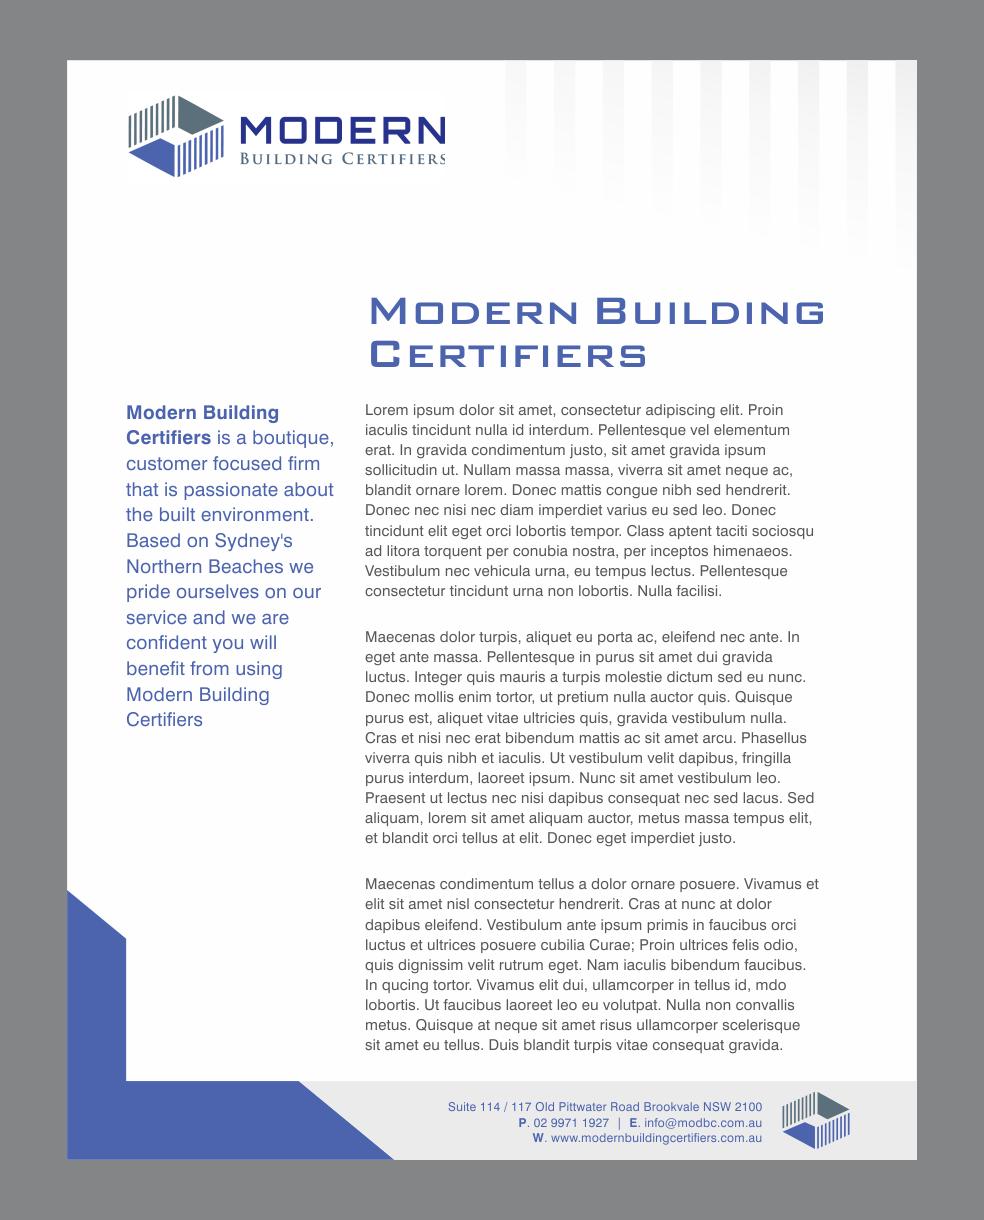 Serio moderno letterhead design for modern building for Certified professional building designer